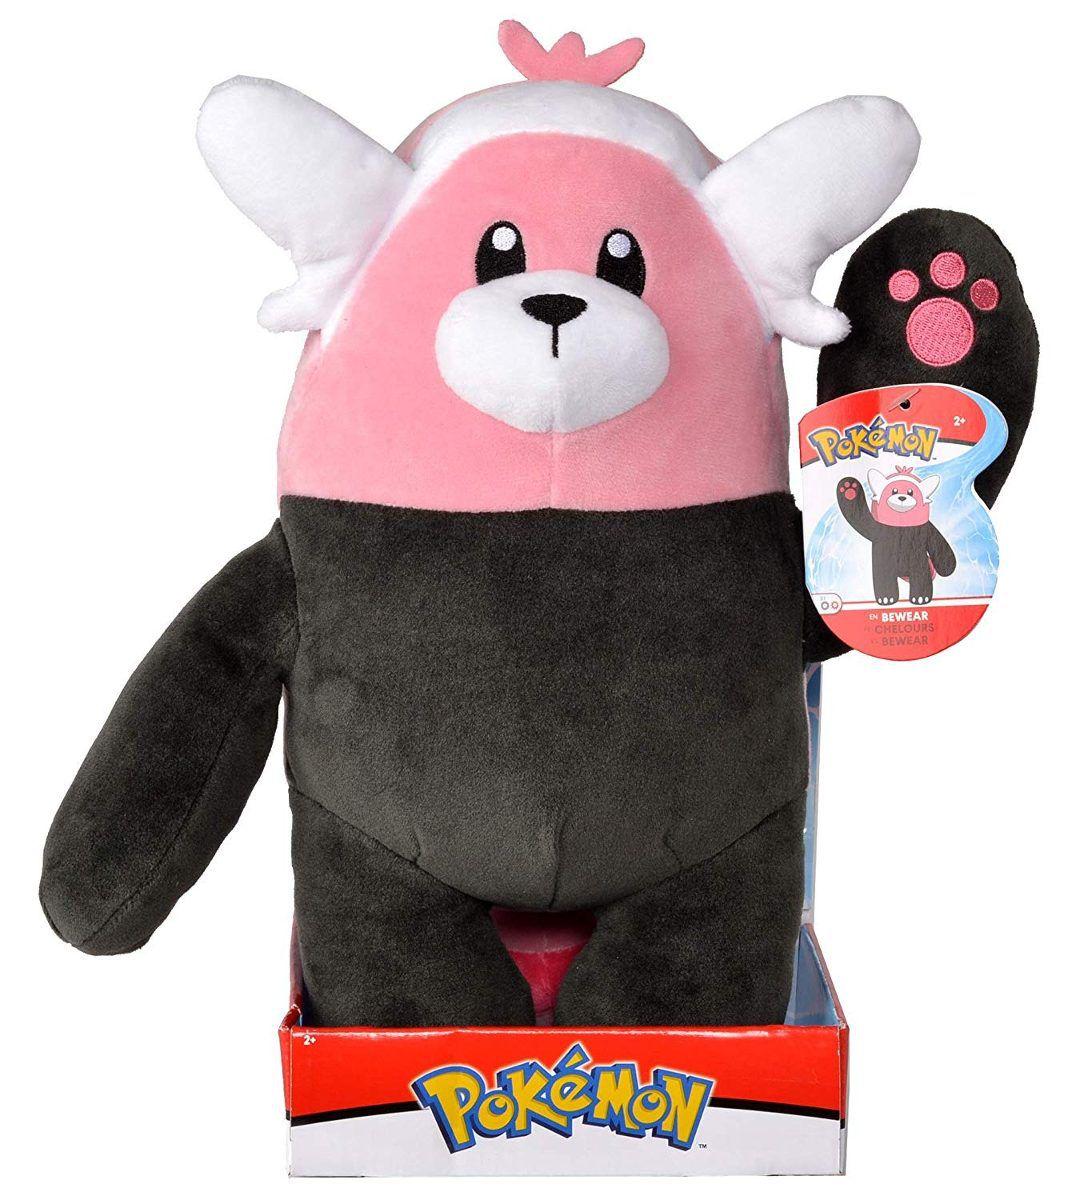 Pokémon Pelúcia Bewear 26 Cm Original - Dtc 4849